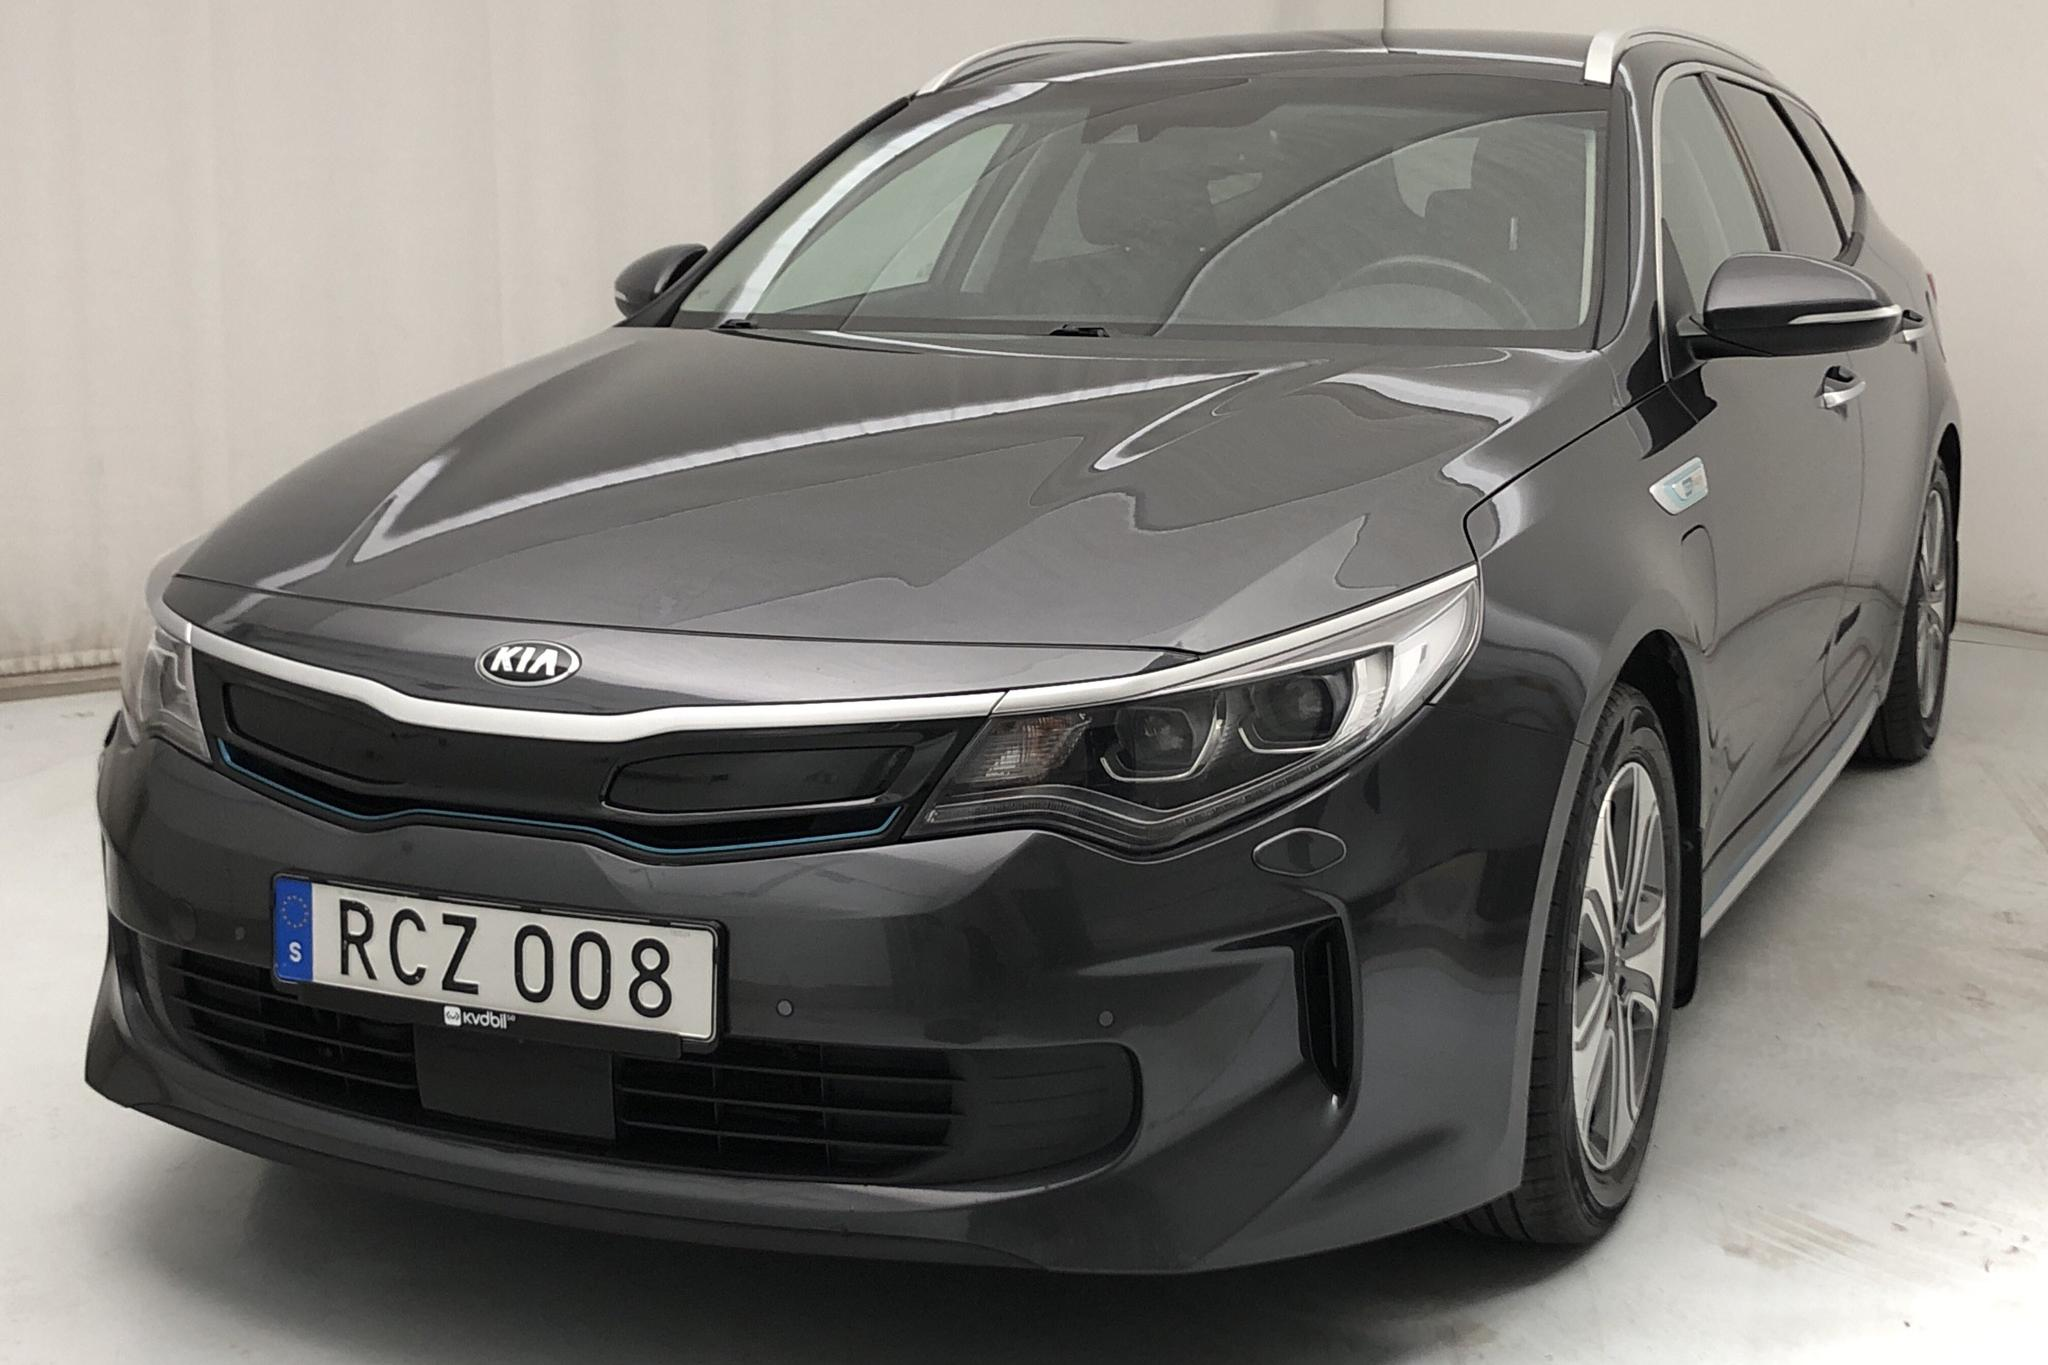 KIA Optima 2.0 GDi Plug-in Hybrid SW (205hk) - 70 600 km - Automatic - gray - 2018